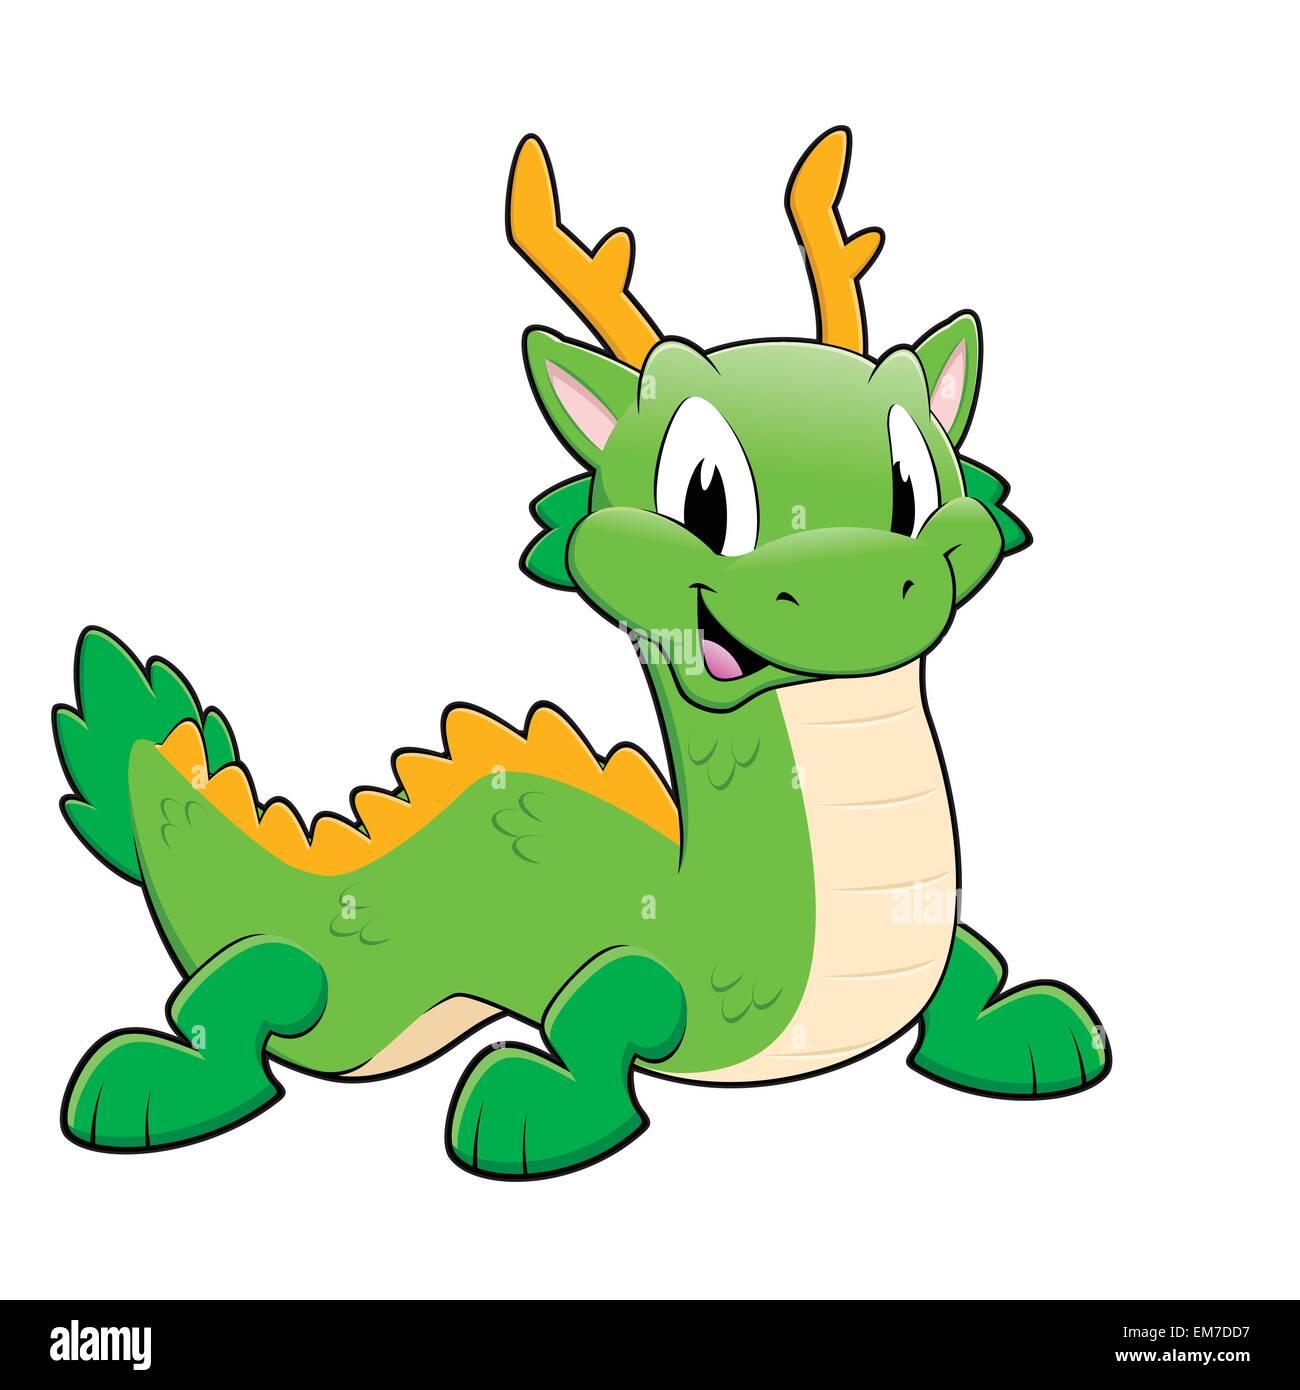 Green Chinese Dragon - Stock Image